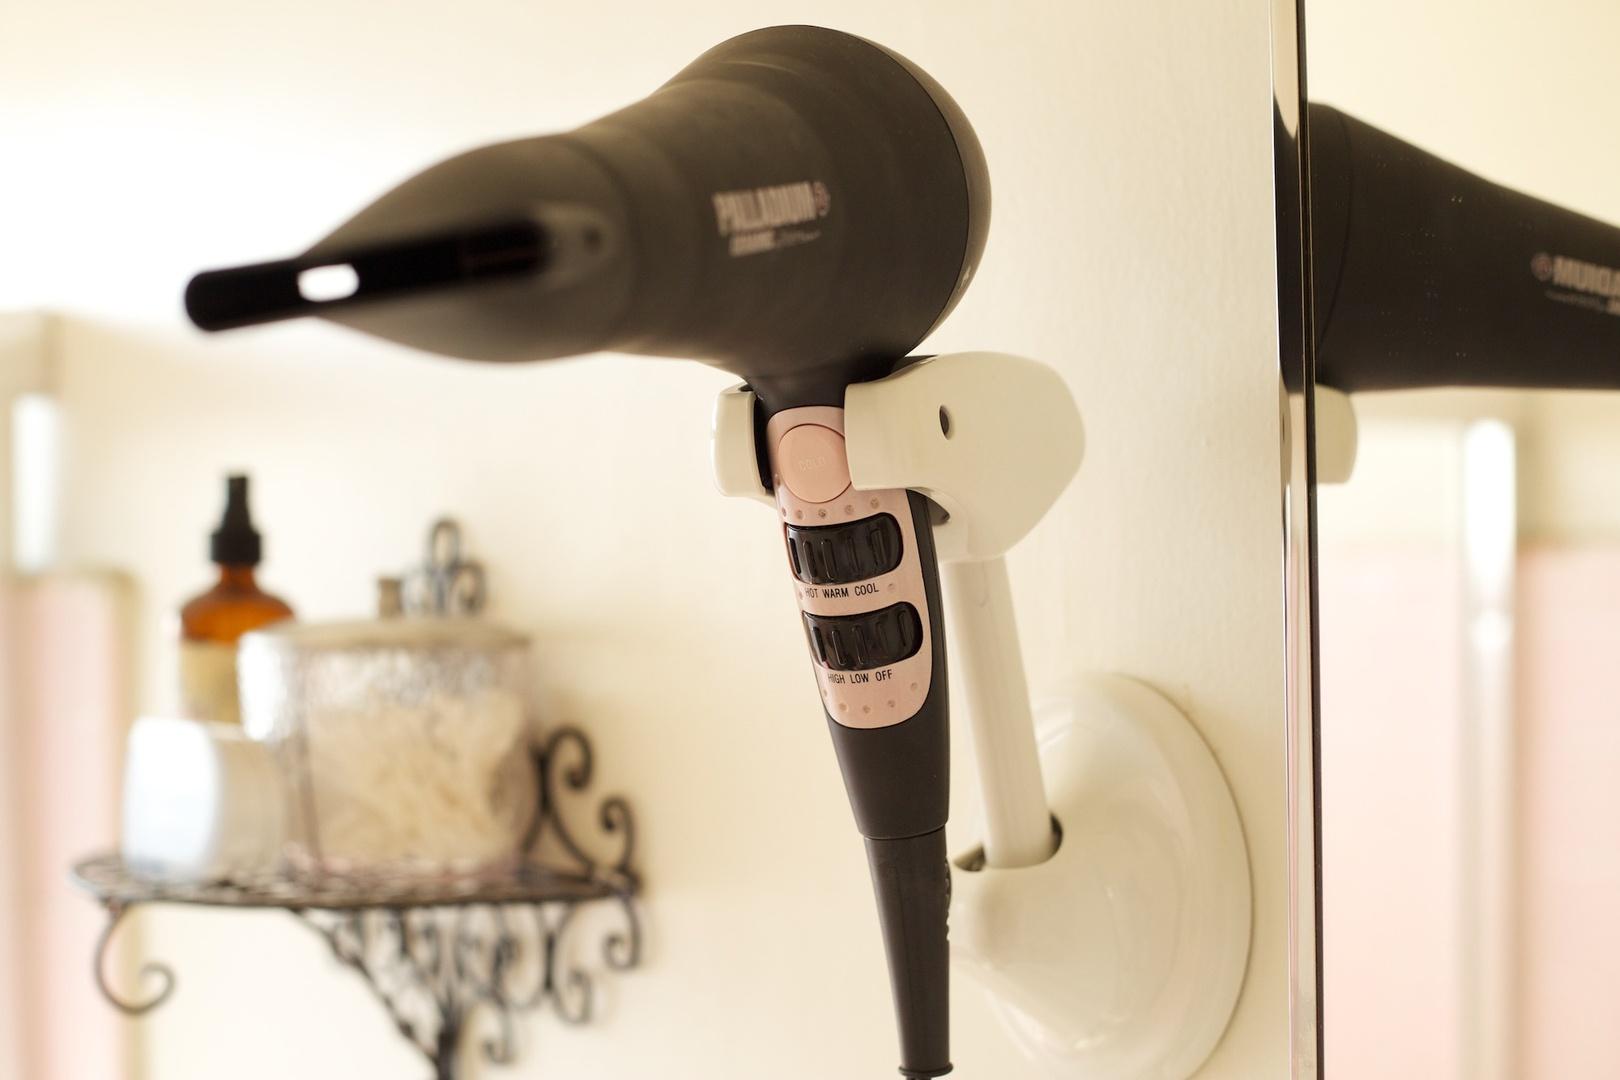 Wall Mount Deluxe Hair Dryer Holder